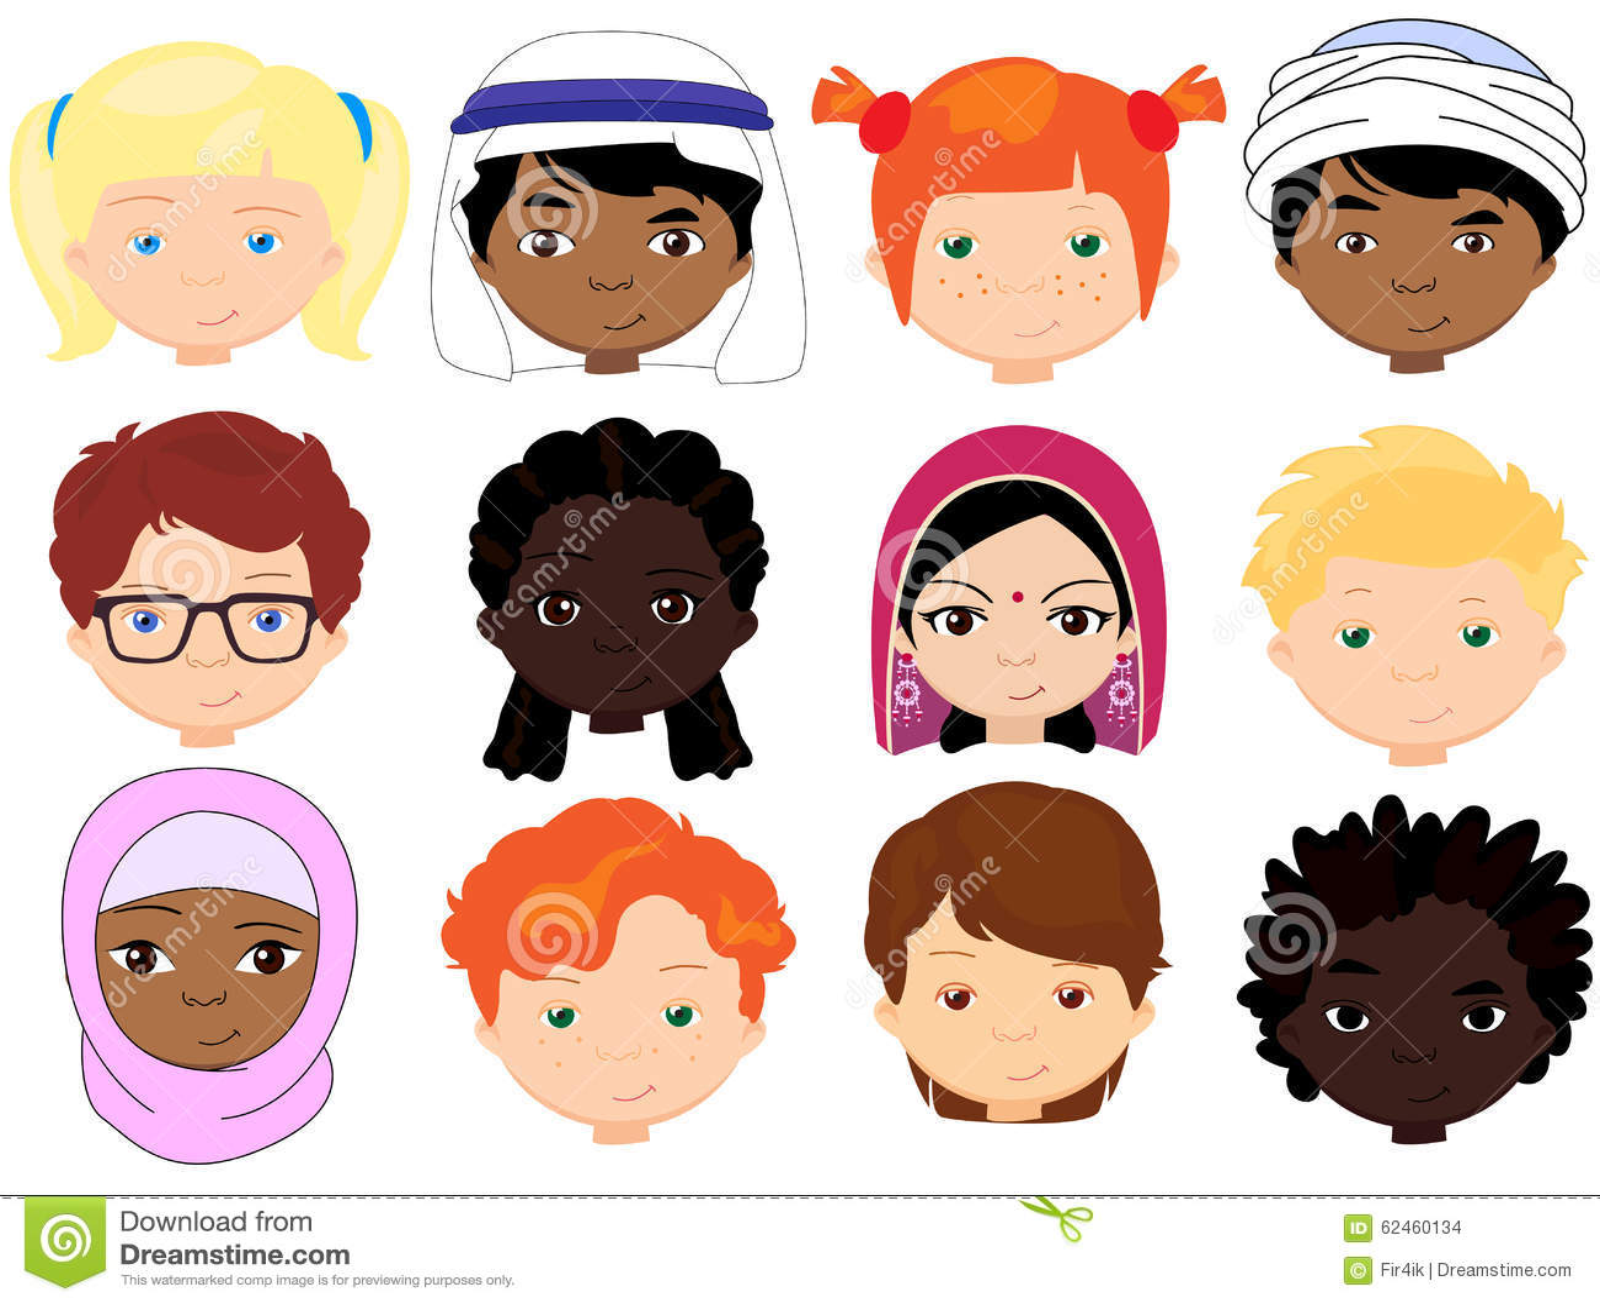 Dibujos De NiÑos Por Nacionalidades: Meninos E Meninas De Nacionalidades Diferentes Childre